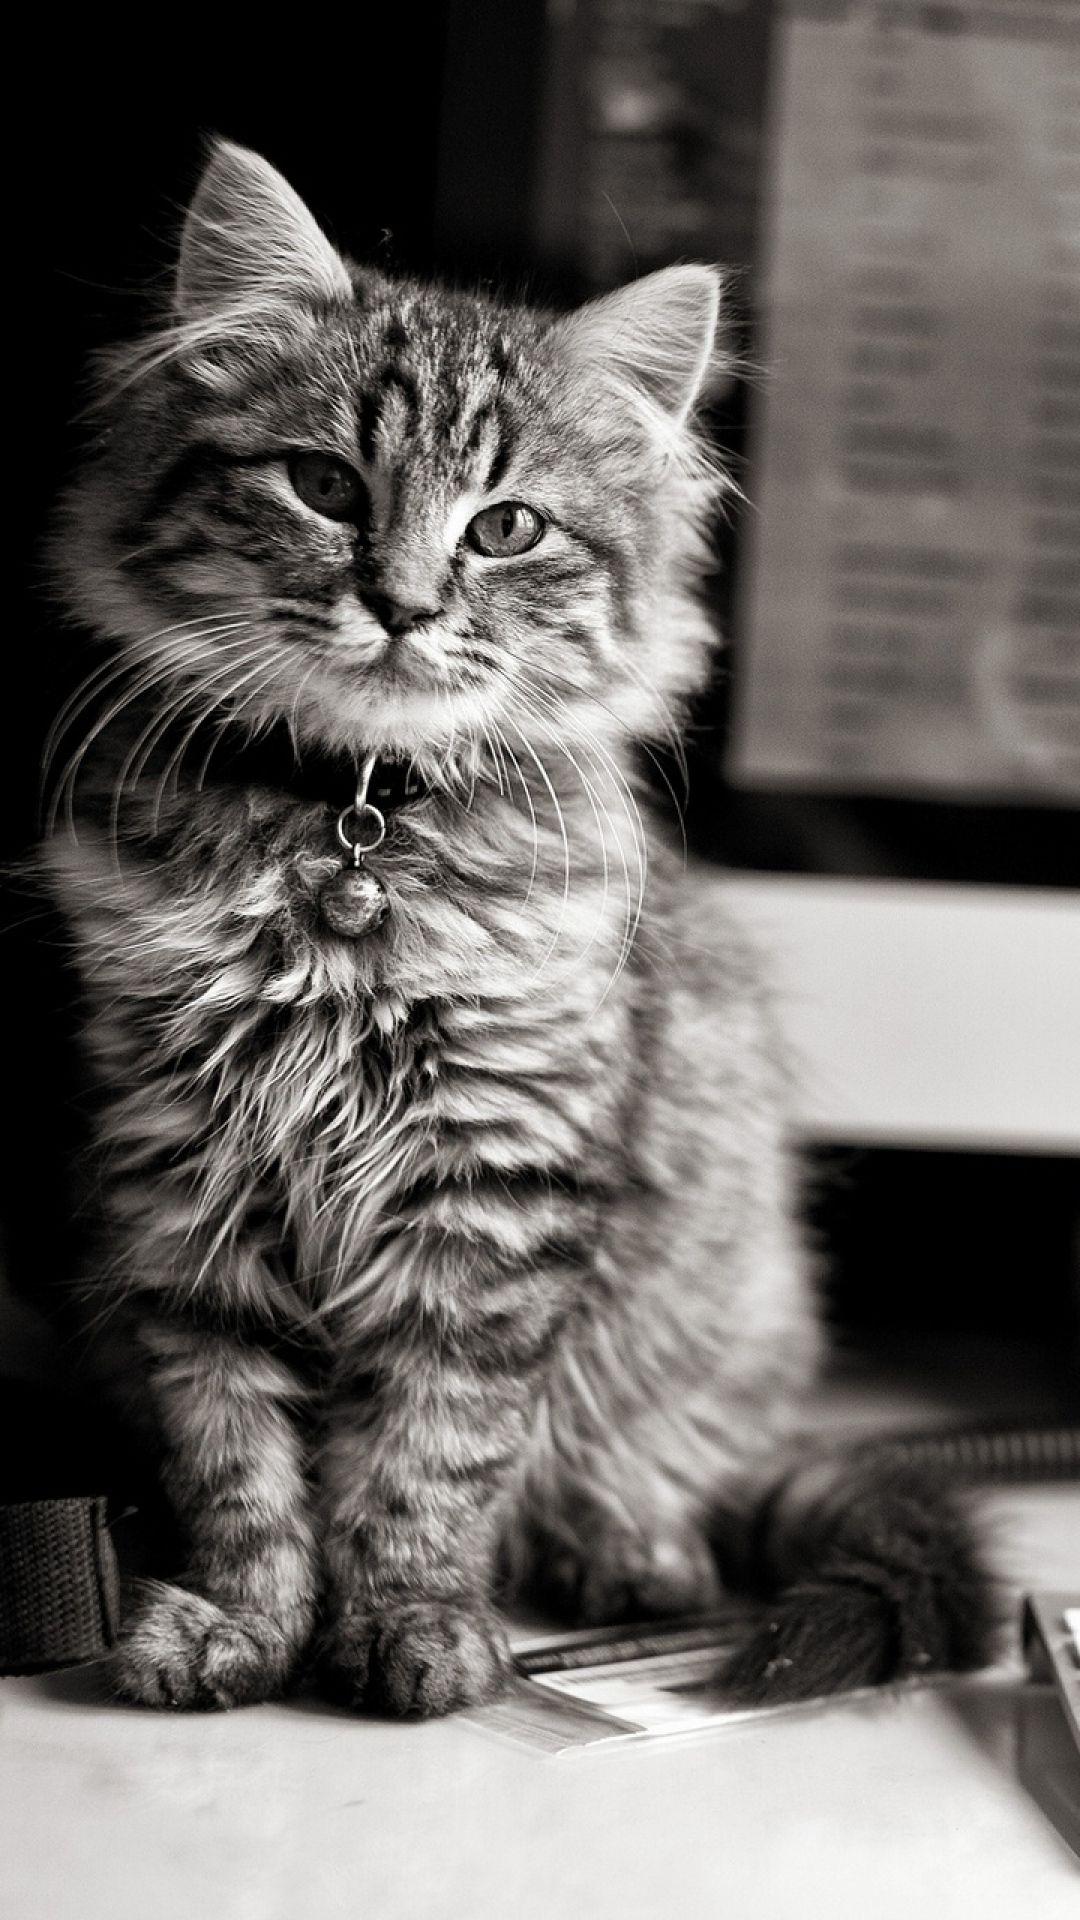 Kitten Cat Computer Keyboard Apple Mac Black And White